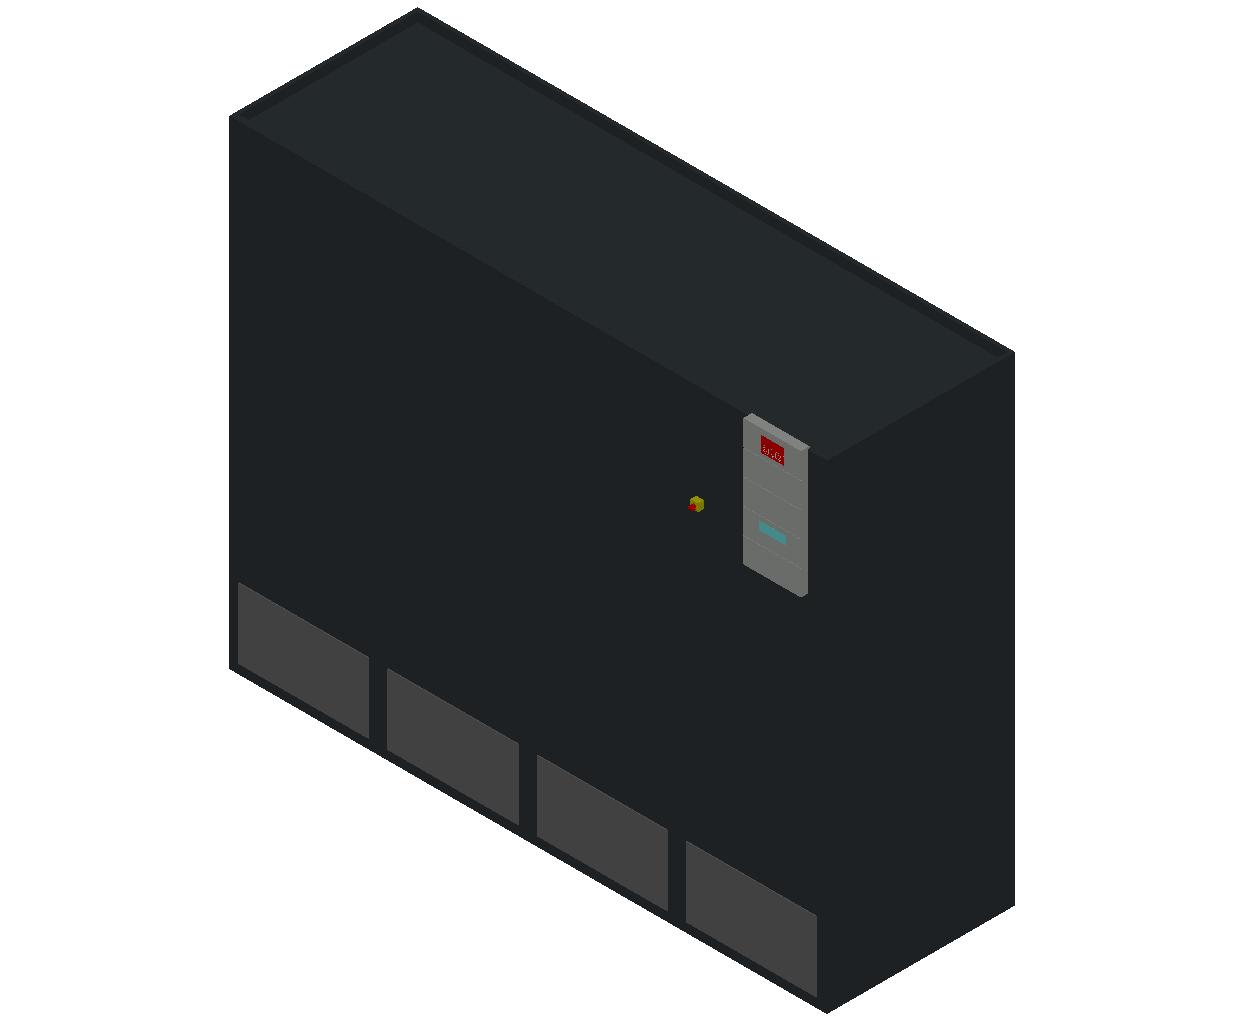 HC_Air Conditioner_Indoor Unit_MEPcontent_STULZ_CyberAir 3PRO_ALR_Dual Circuit GES_ALR_832_GES_INT-EN.dwg